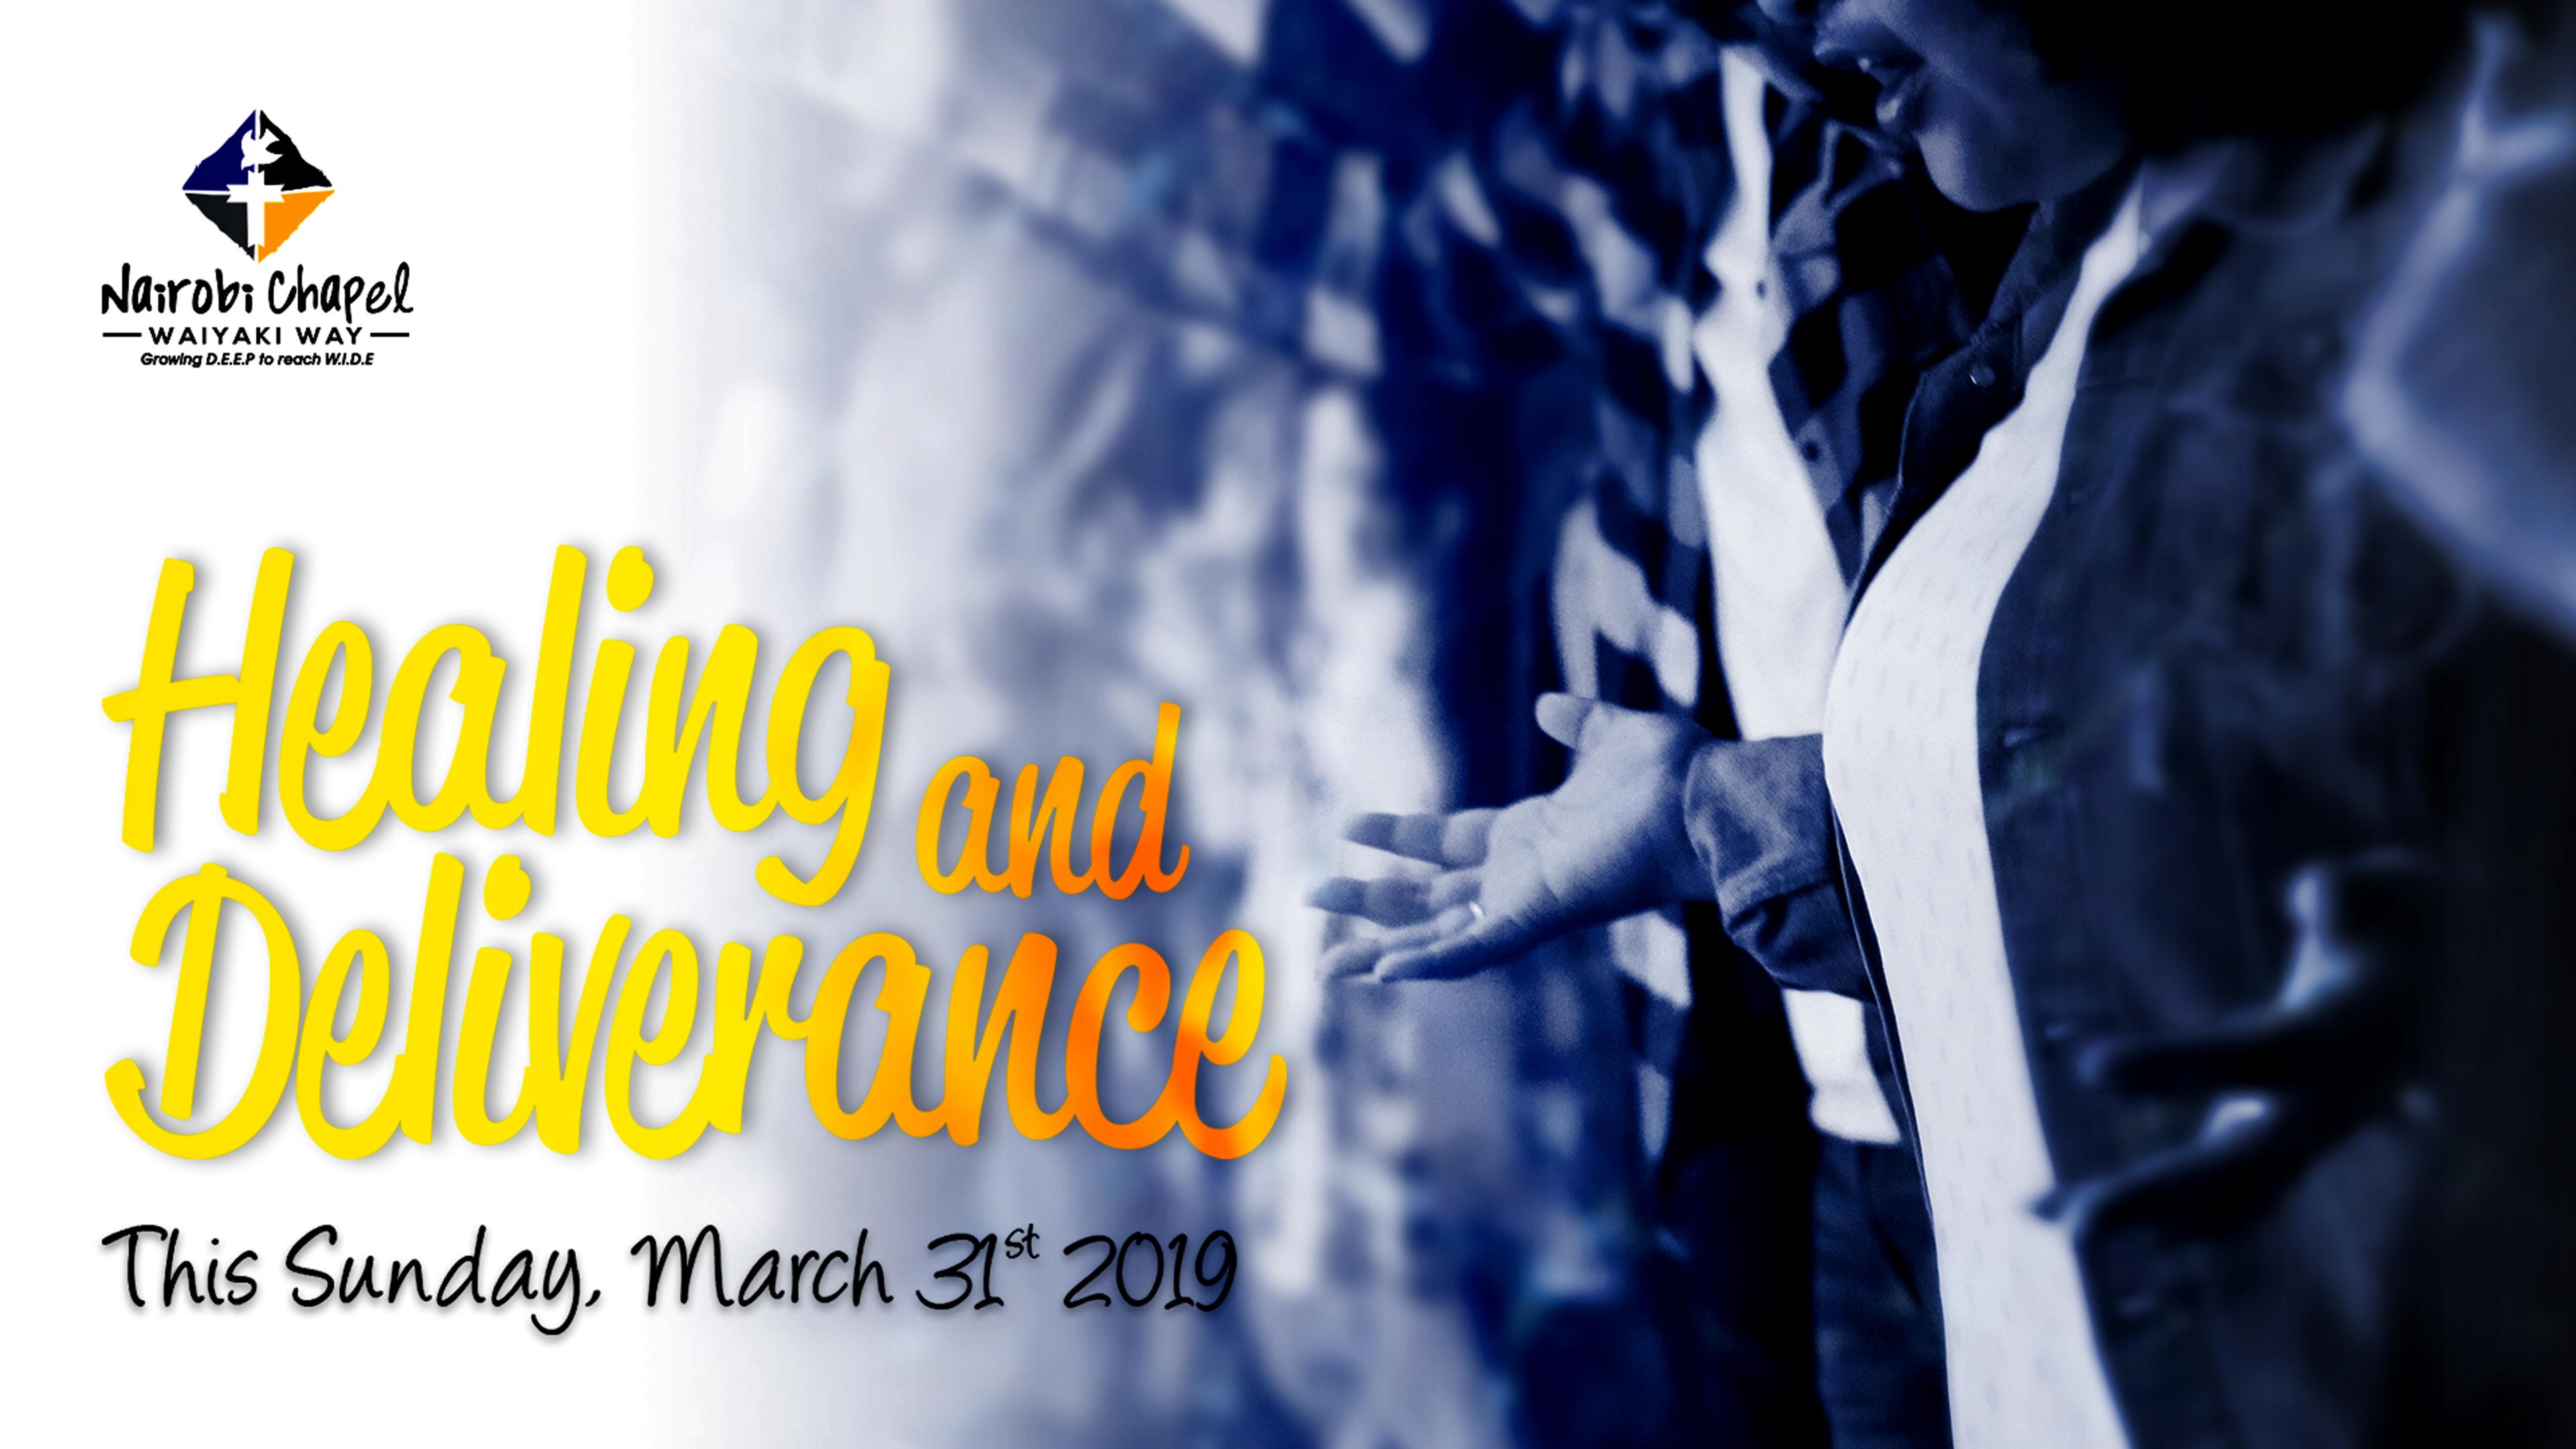 Prayer and Healing Service